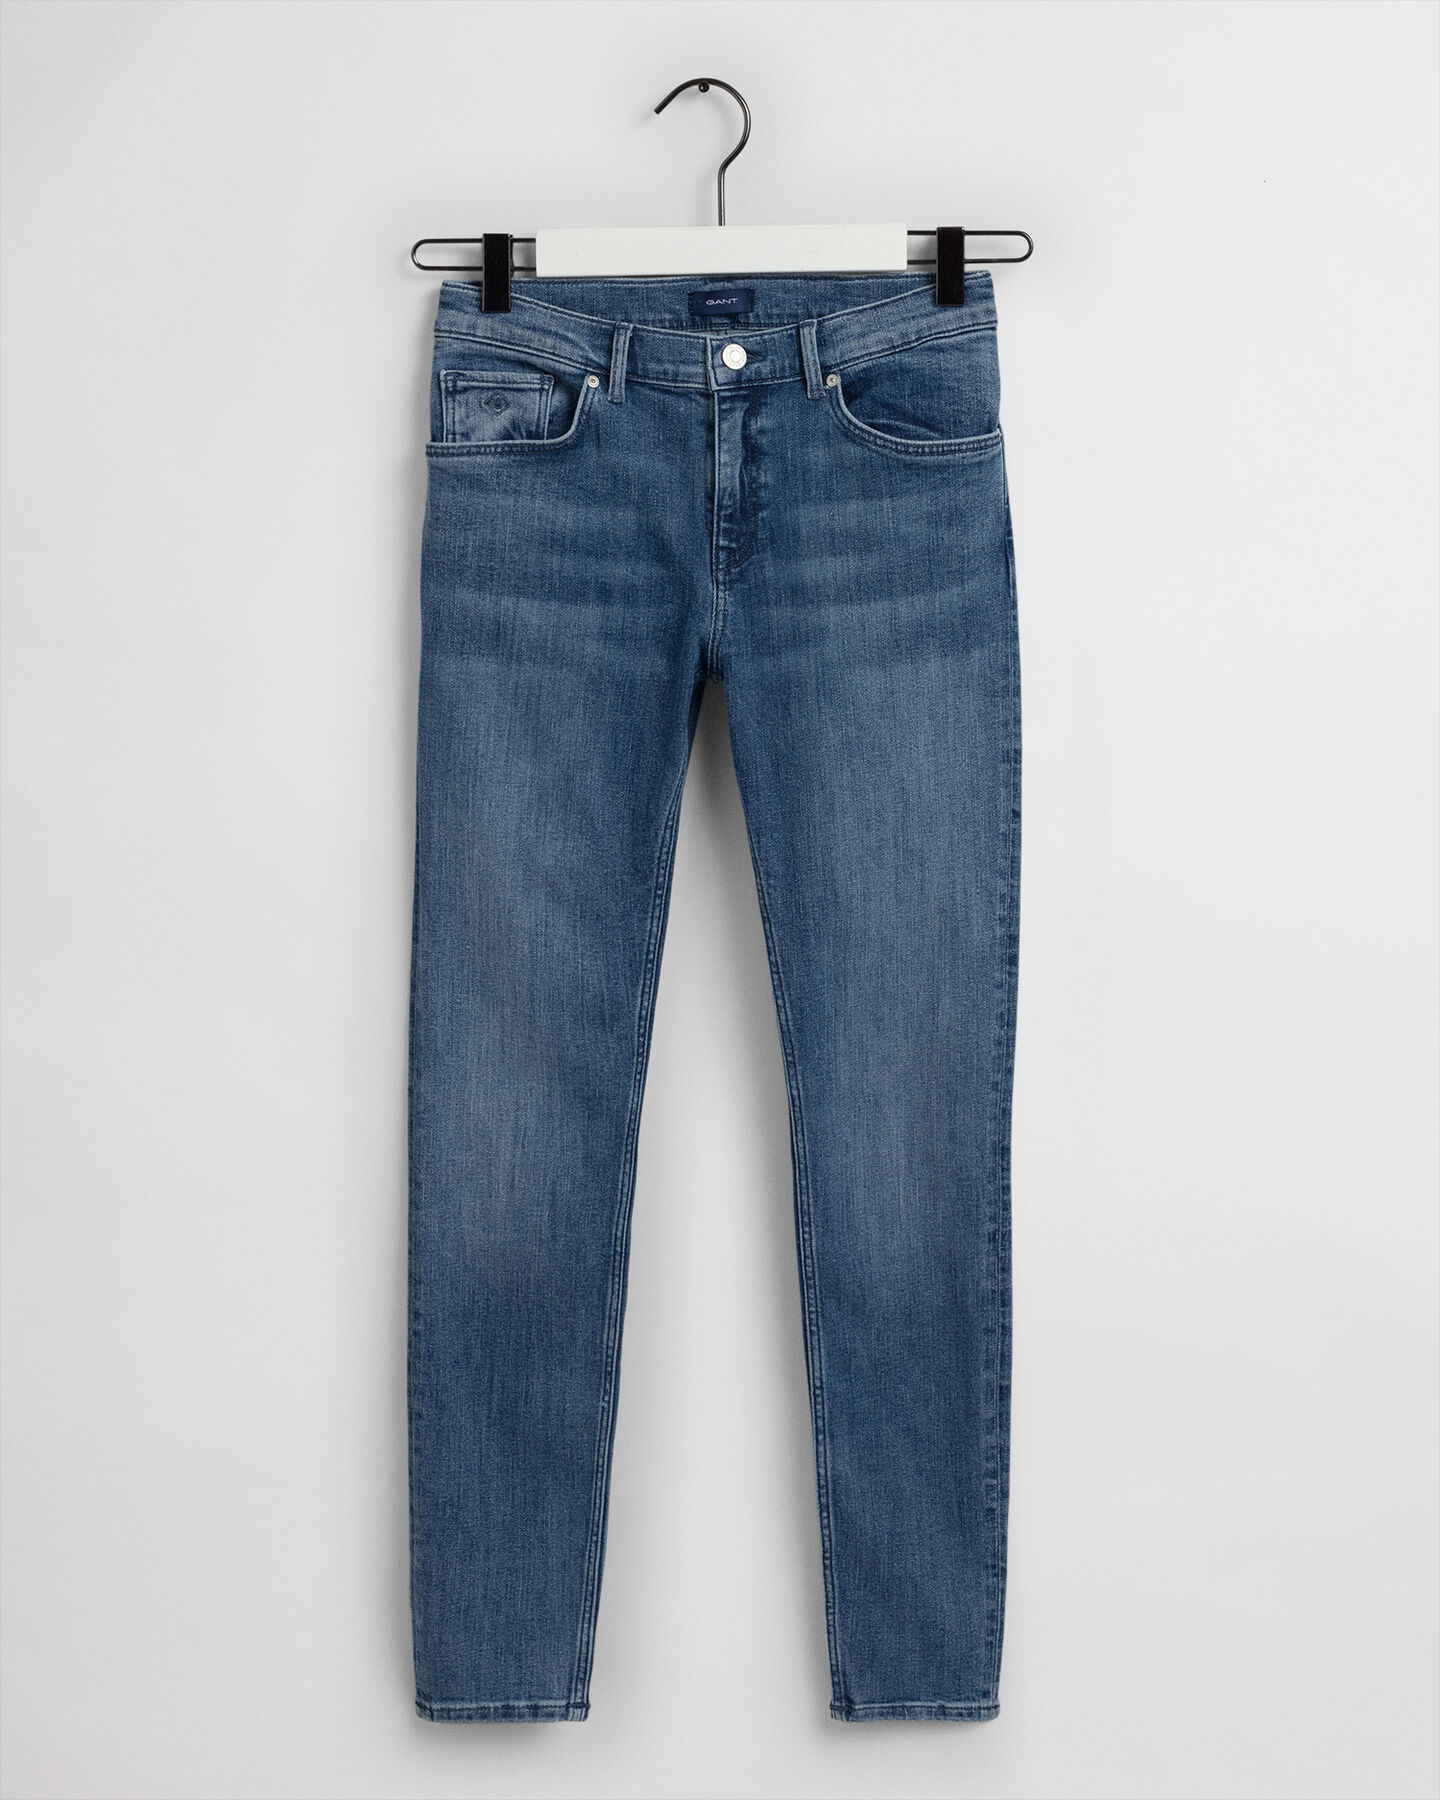 Teen Girls Skinny jeans